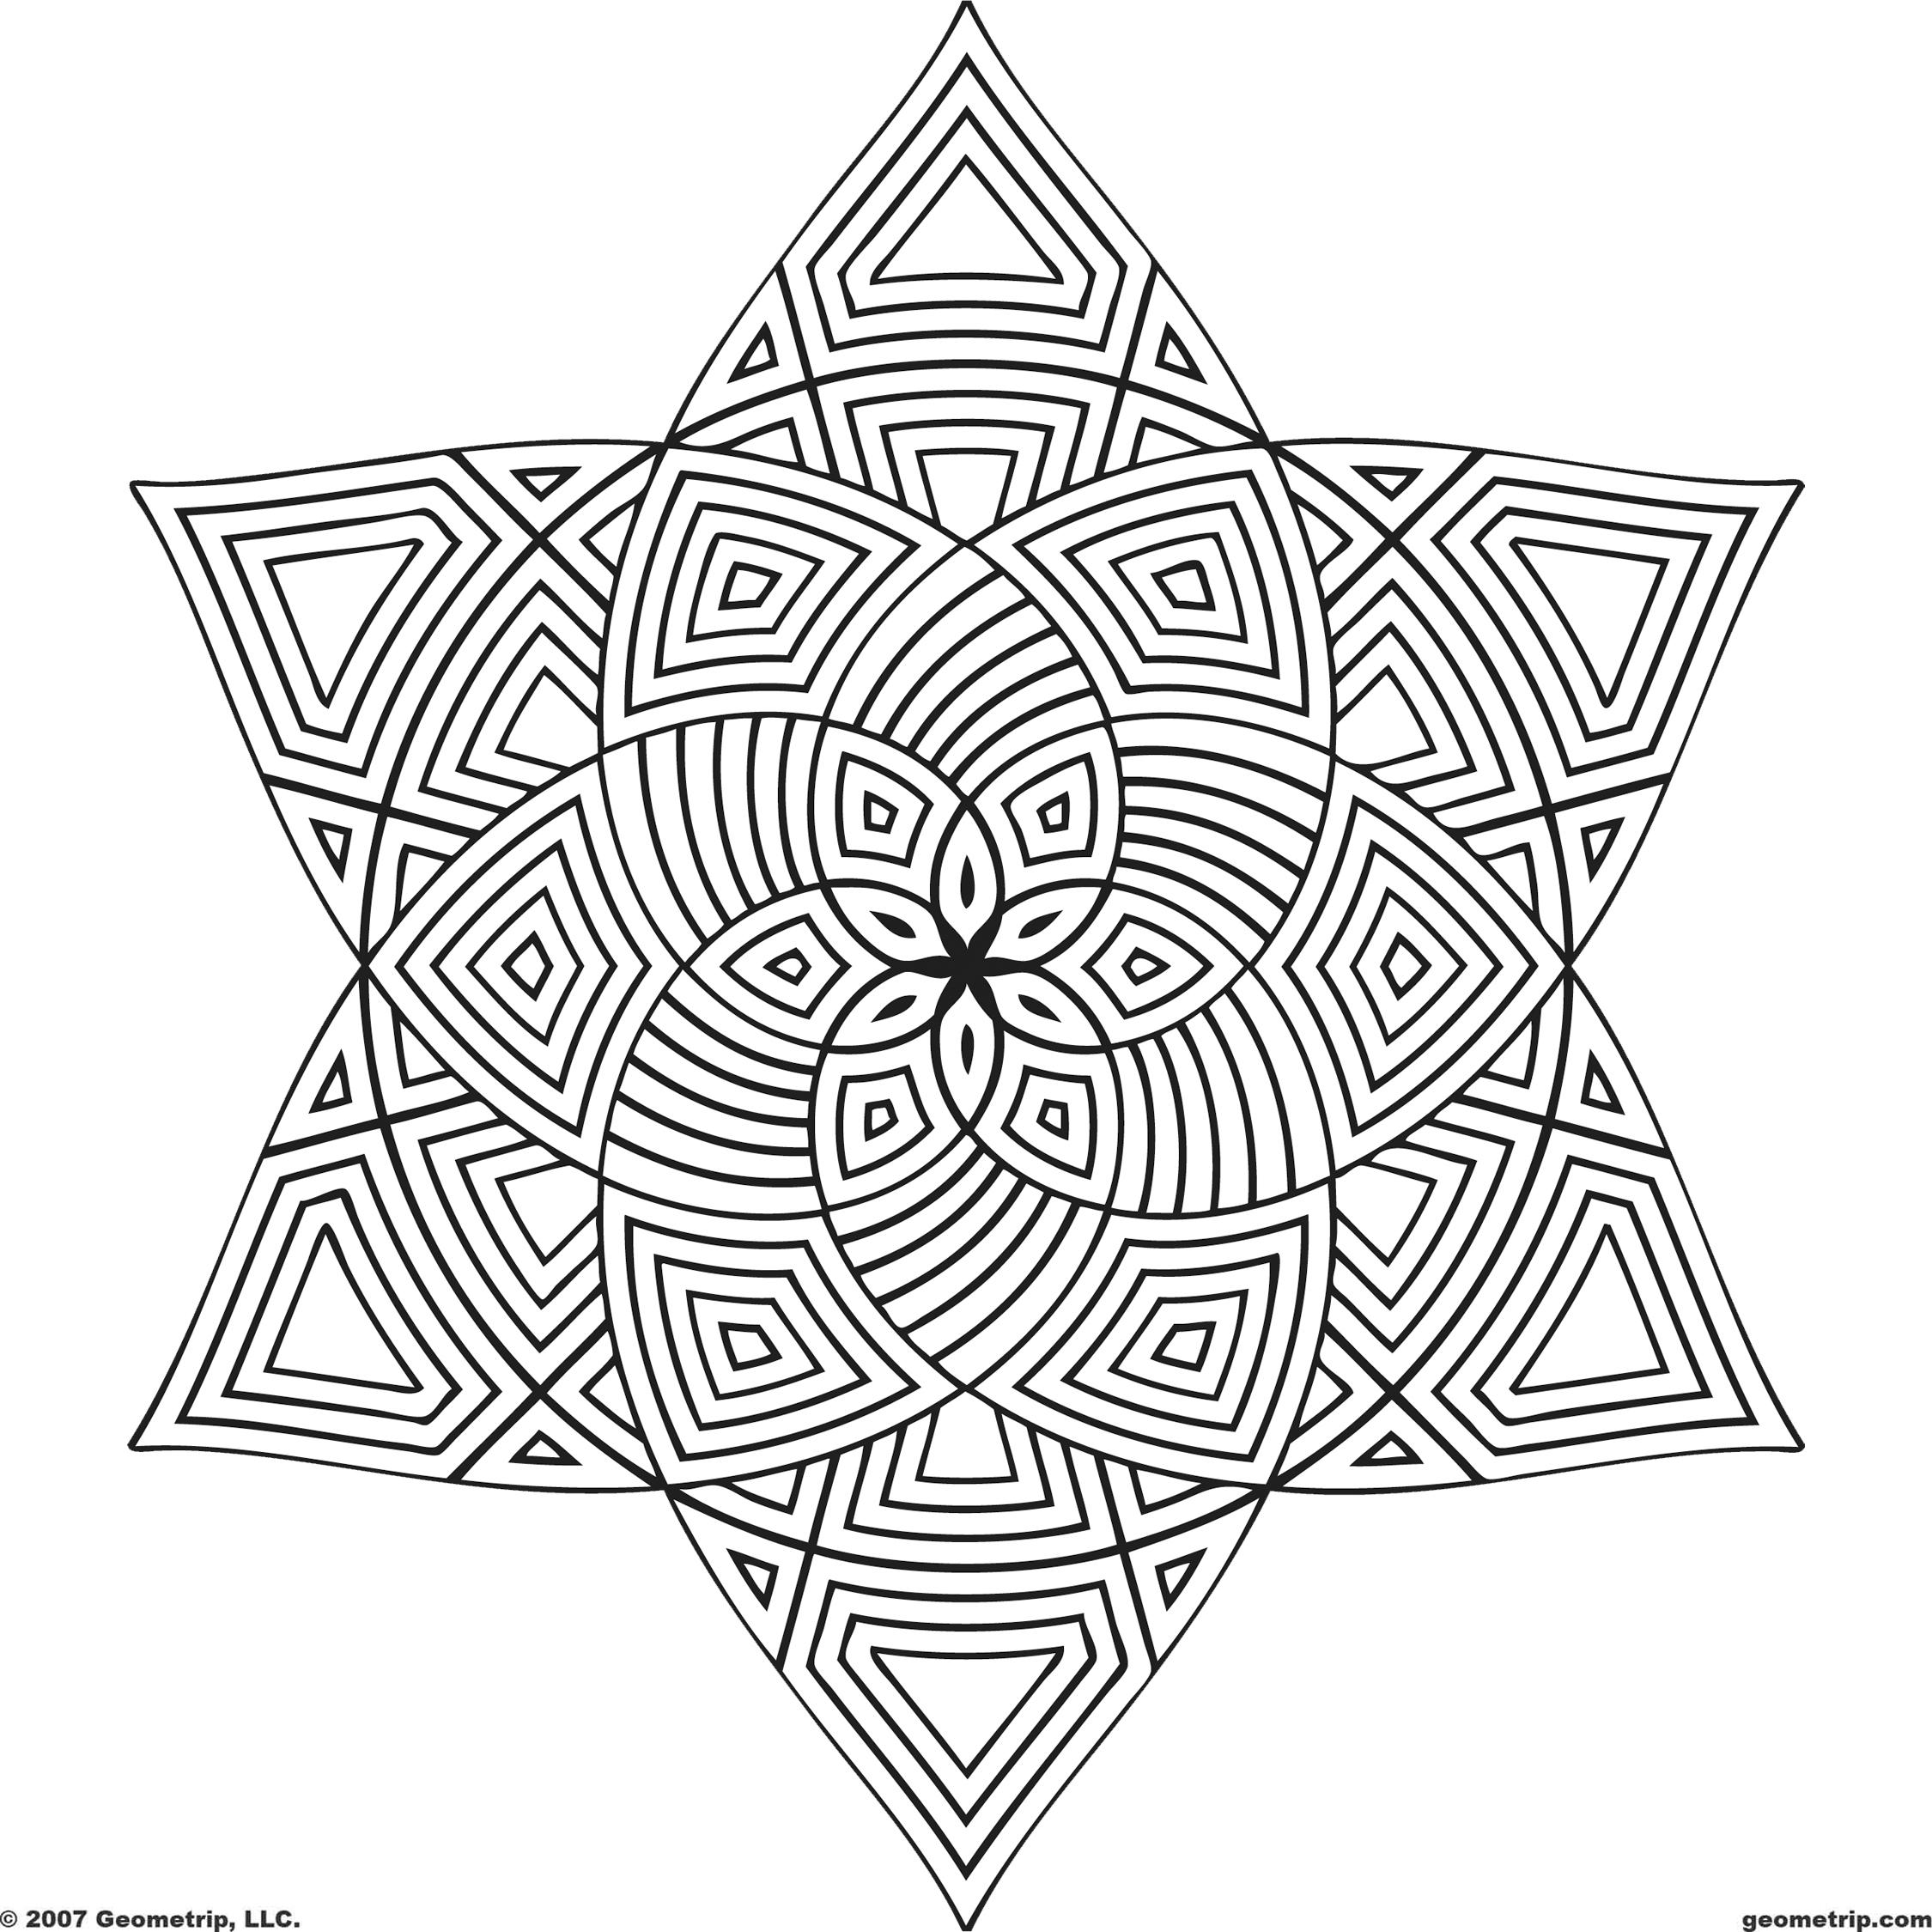 2250x2250 Coloring Page Shape Geometric Designs